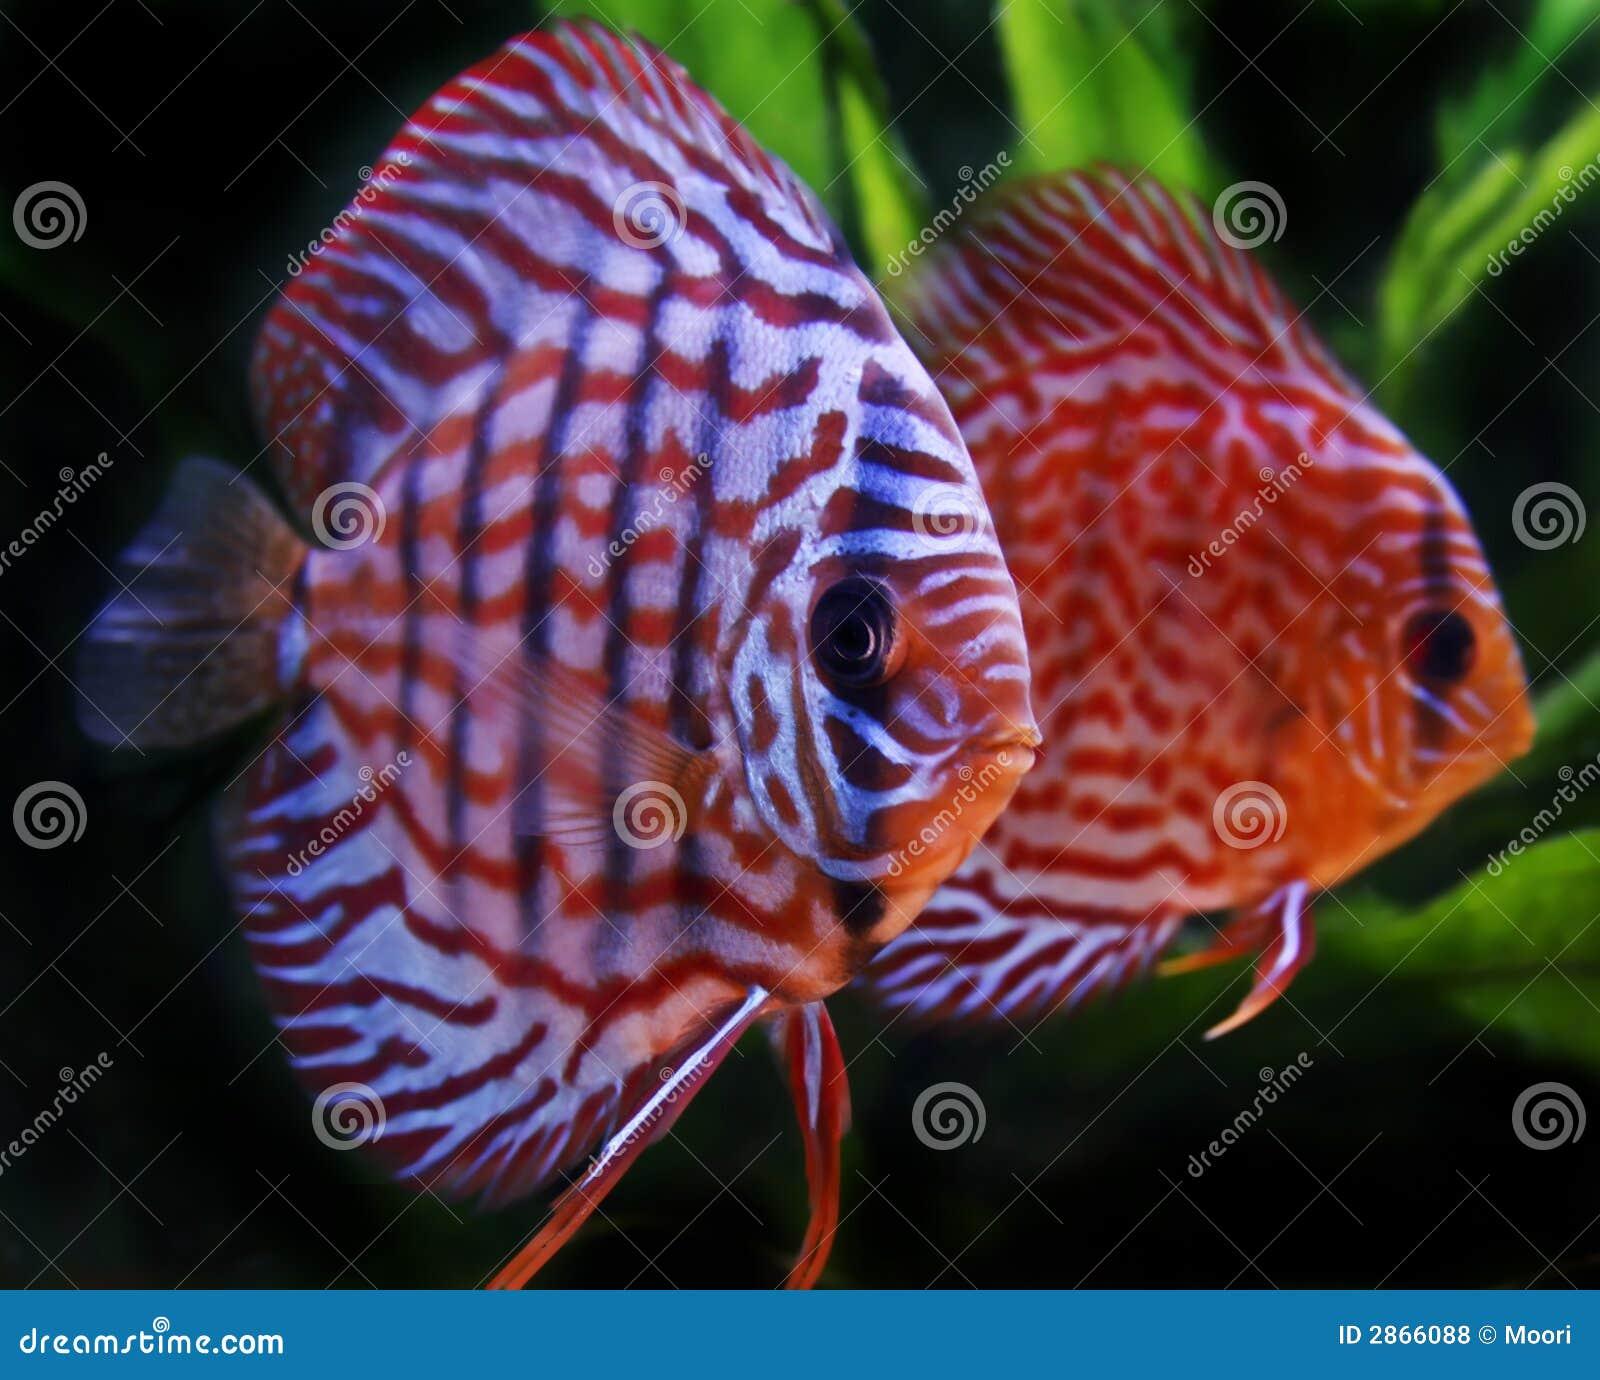 Pesci del discus fotografie stock libere da diritti for Pesce discus